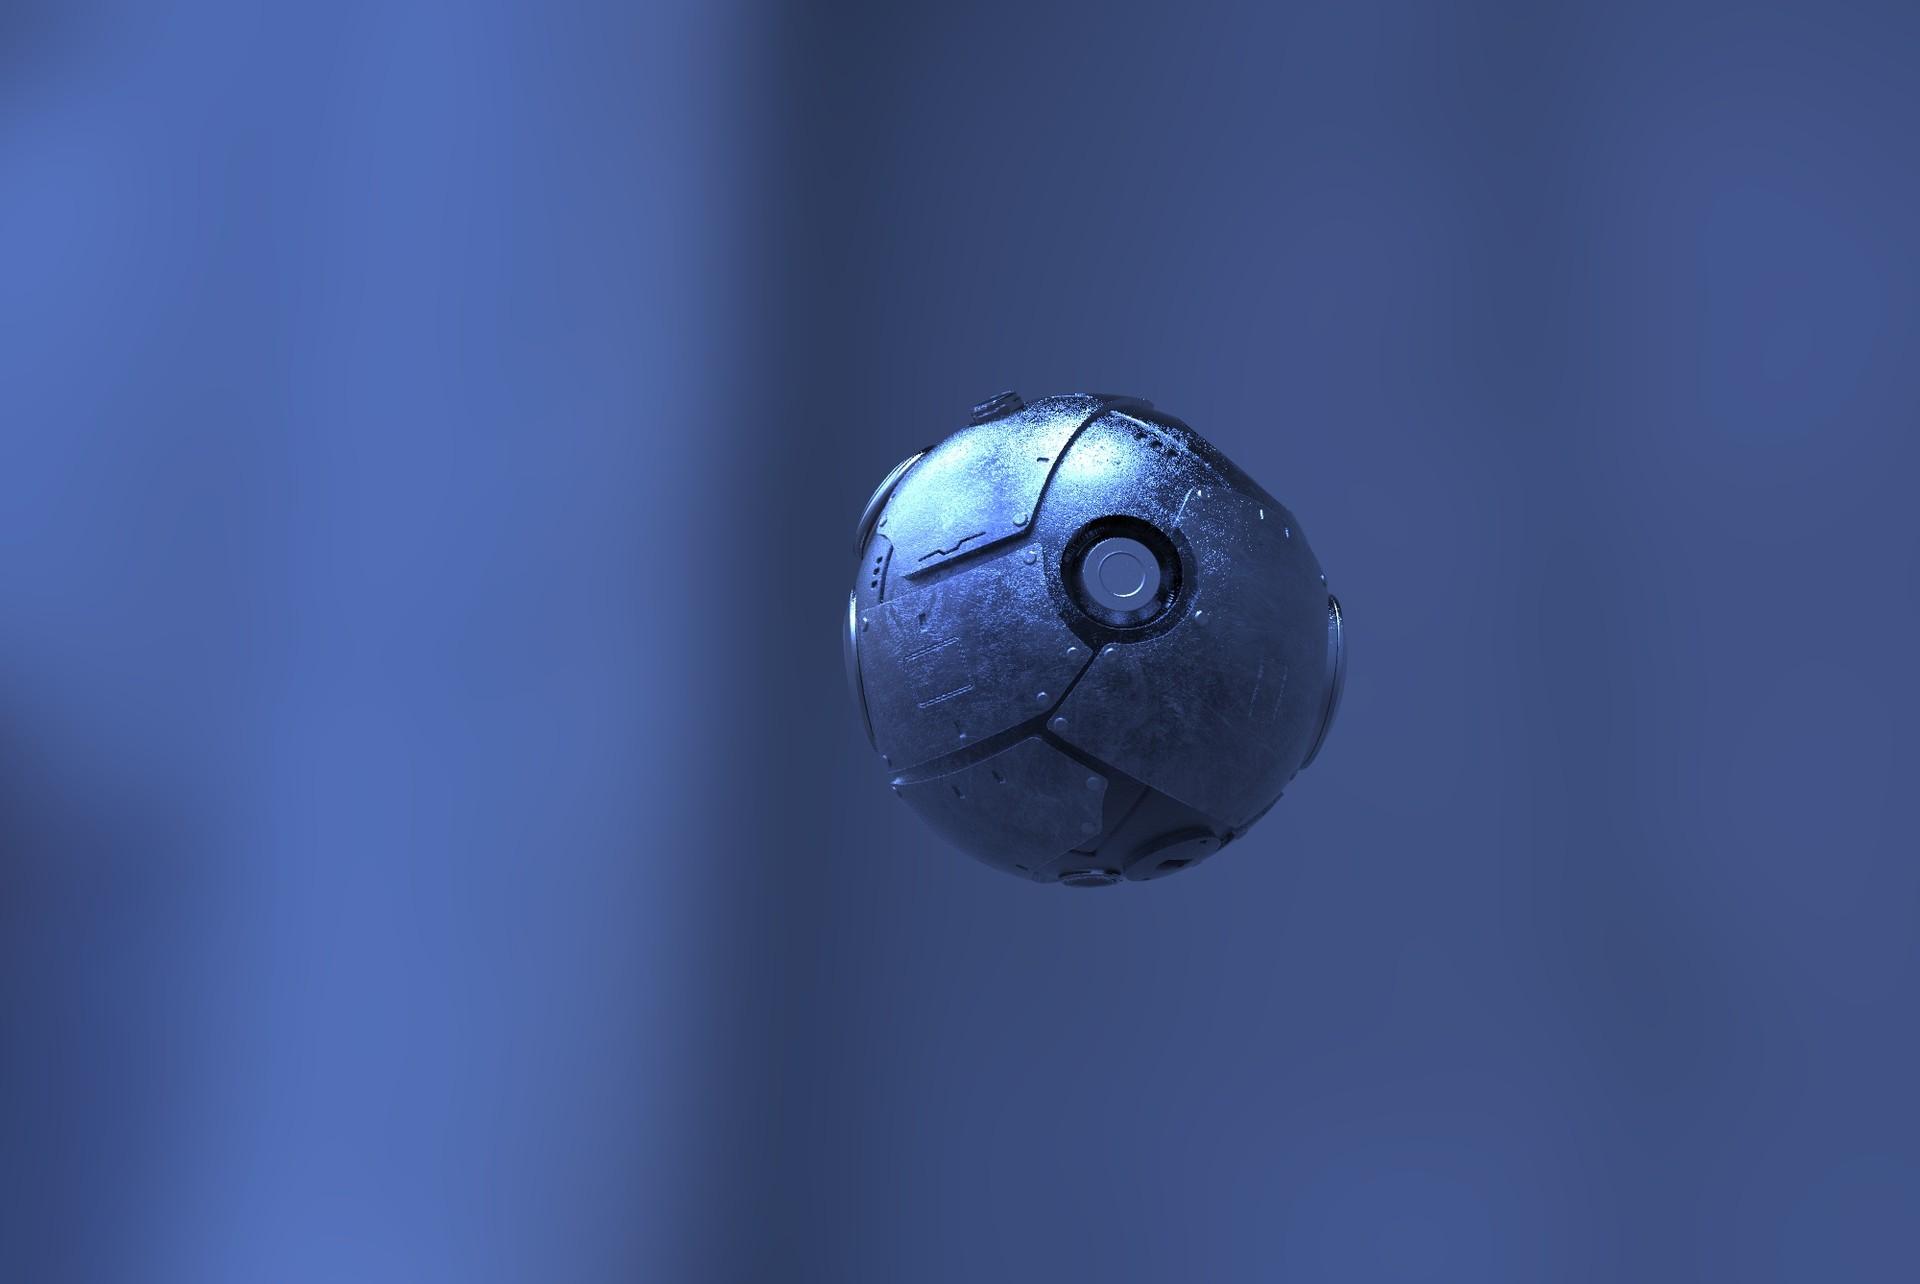 Tek tan ball 2456